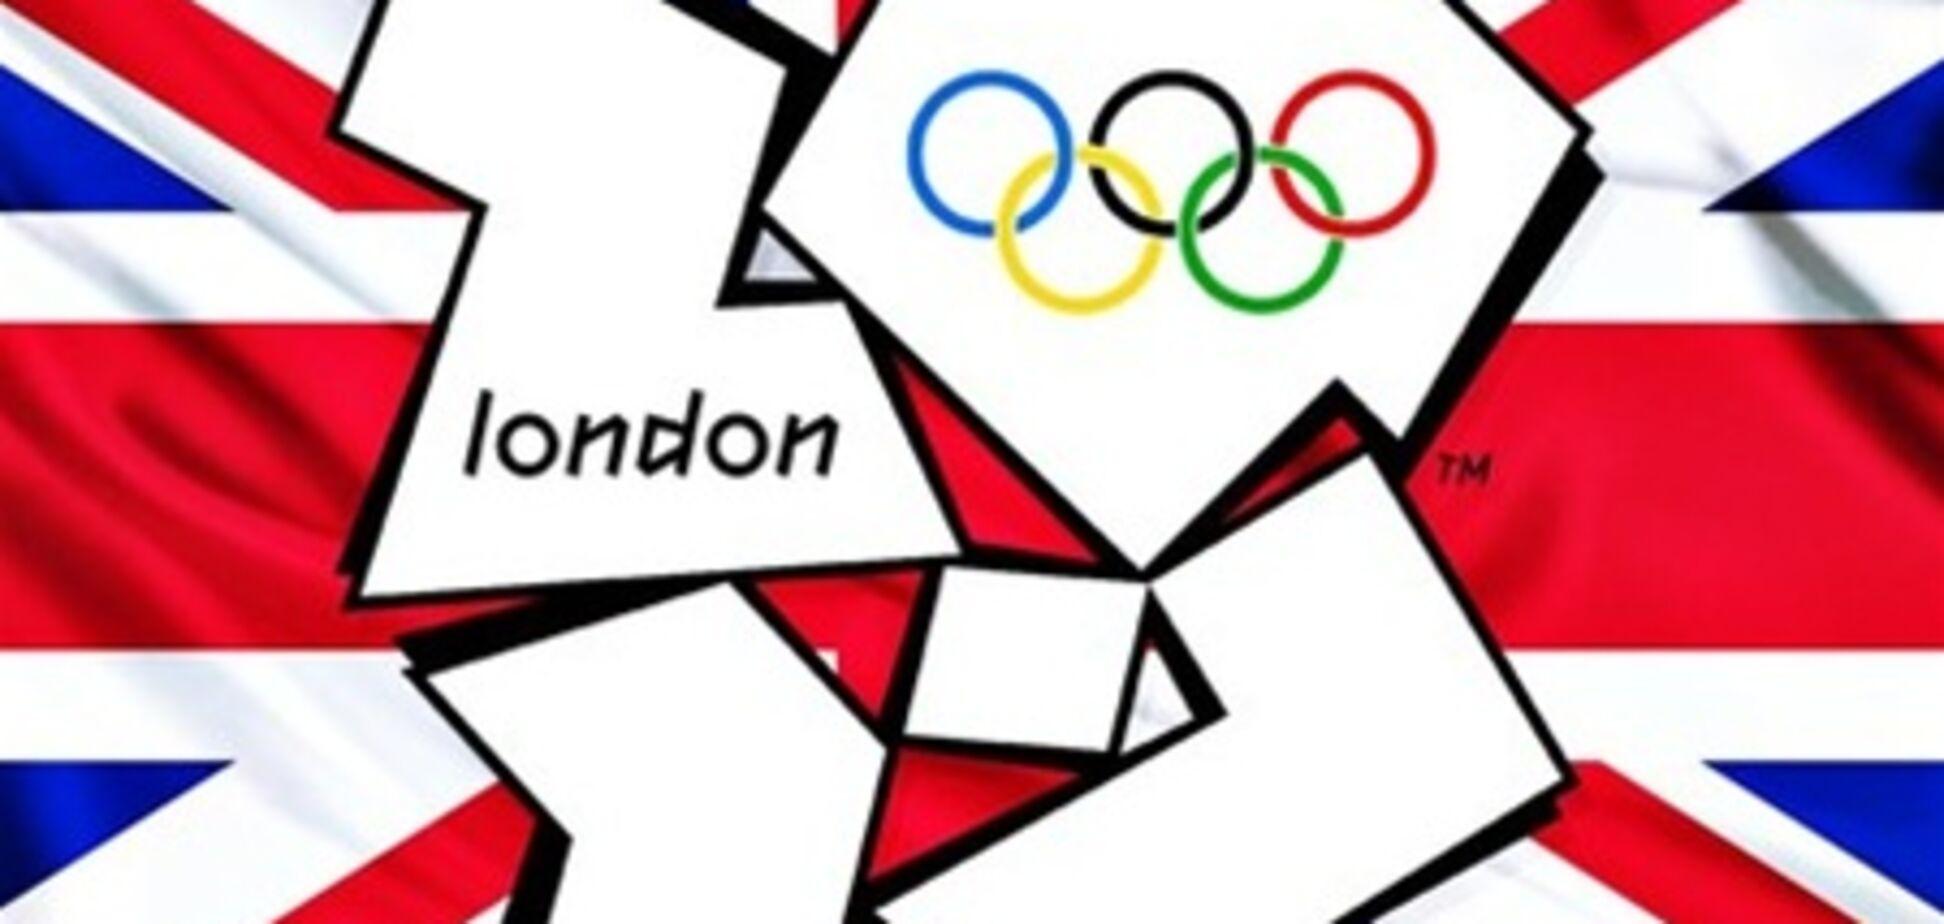 Организаторы Олимпиады-2012 сэкономили почти полмиллиарда